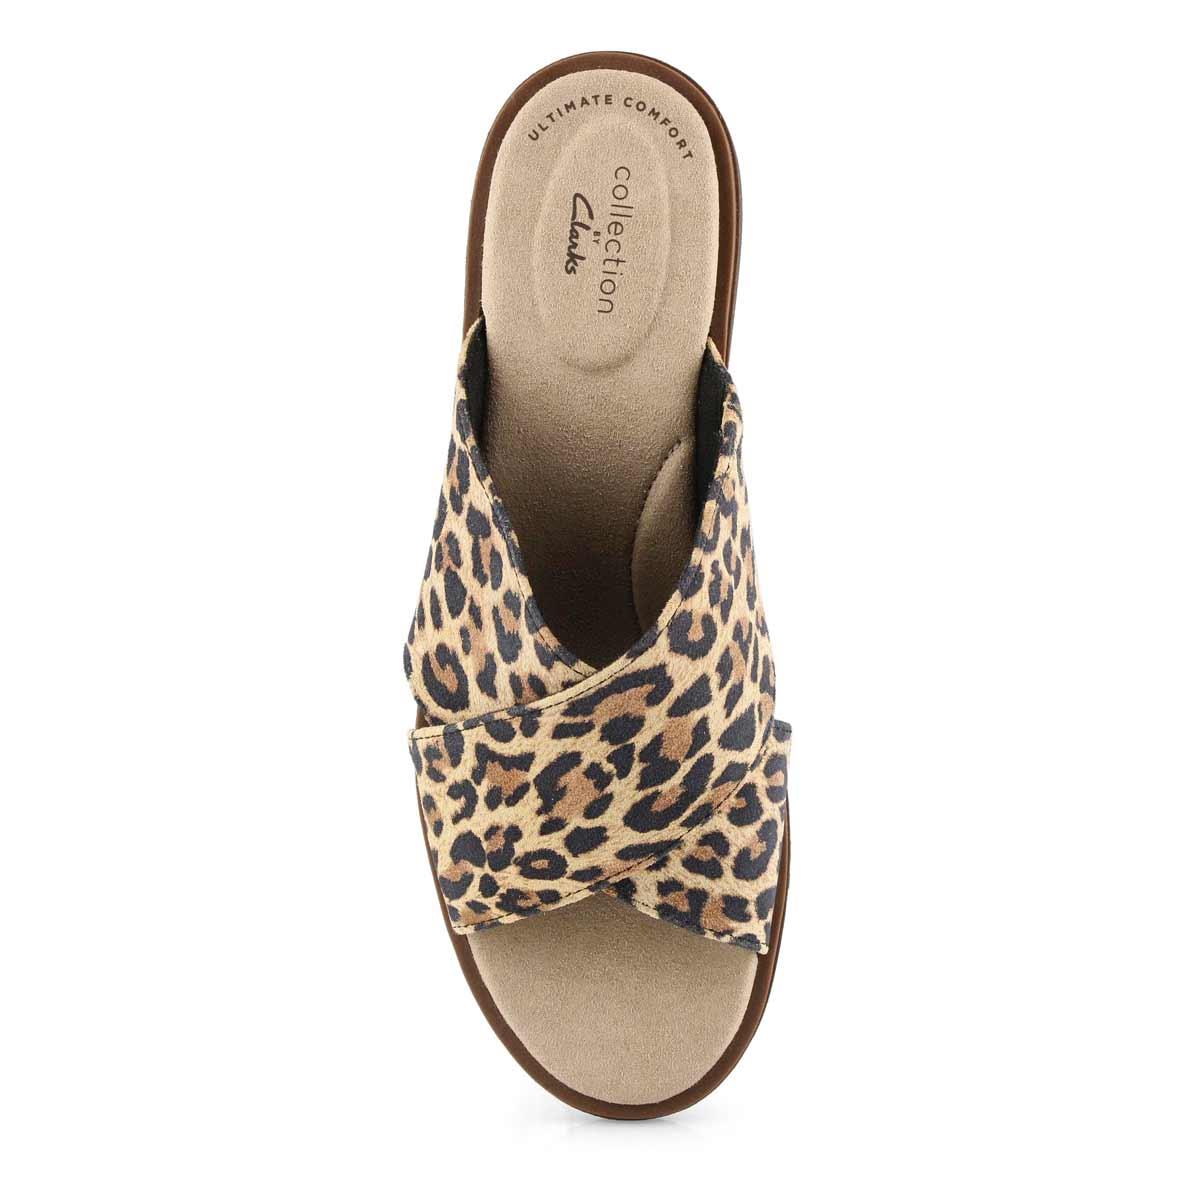 Lds Declan Ivy tan leopard slide sandals